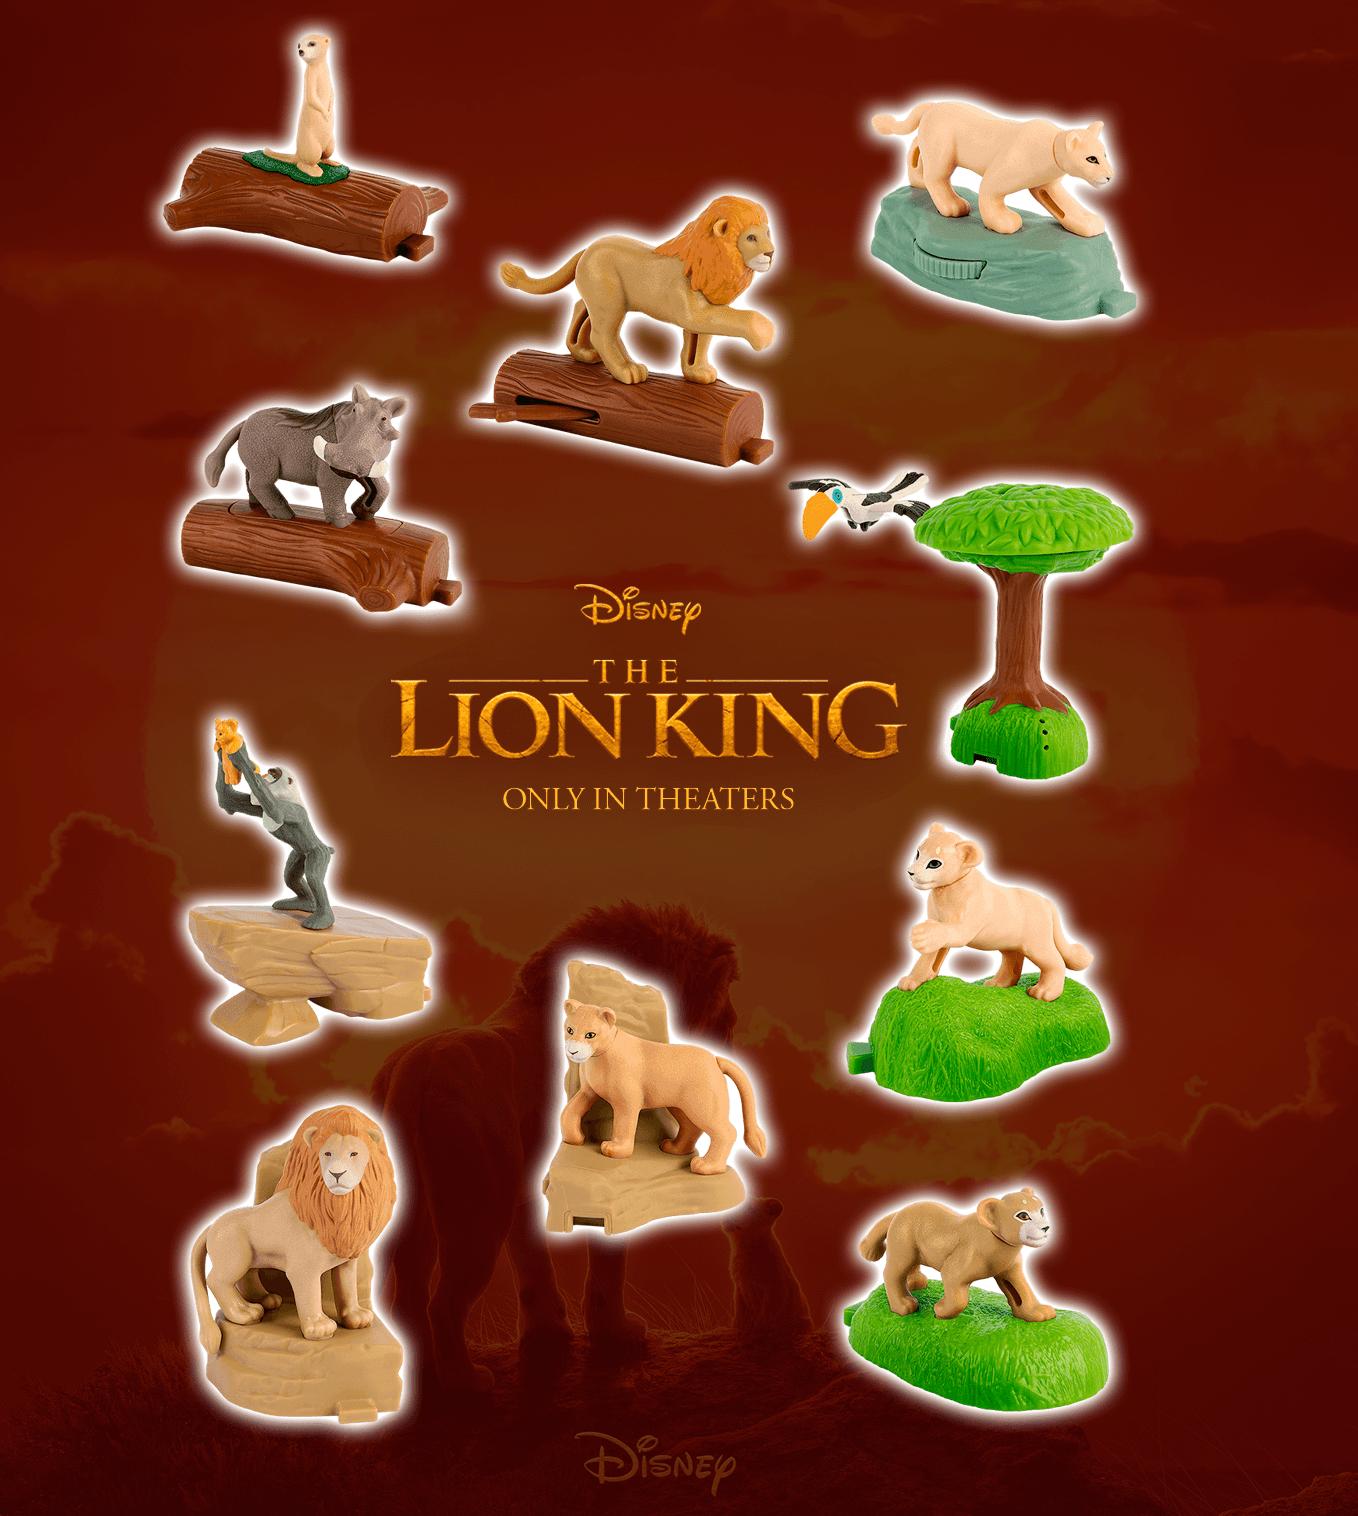 The Lion King Mcdonald S Collection 2019 Disney Merchandise Wiki Fandom